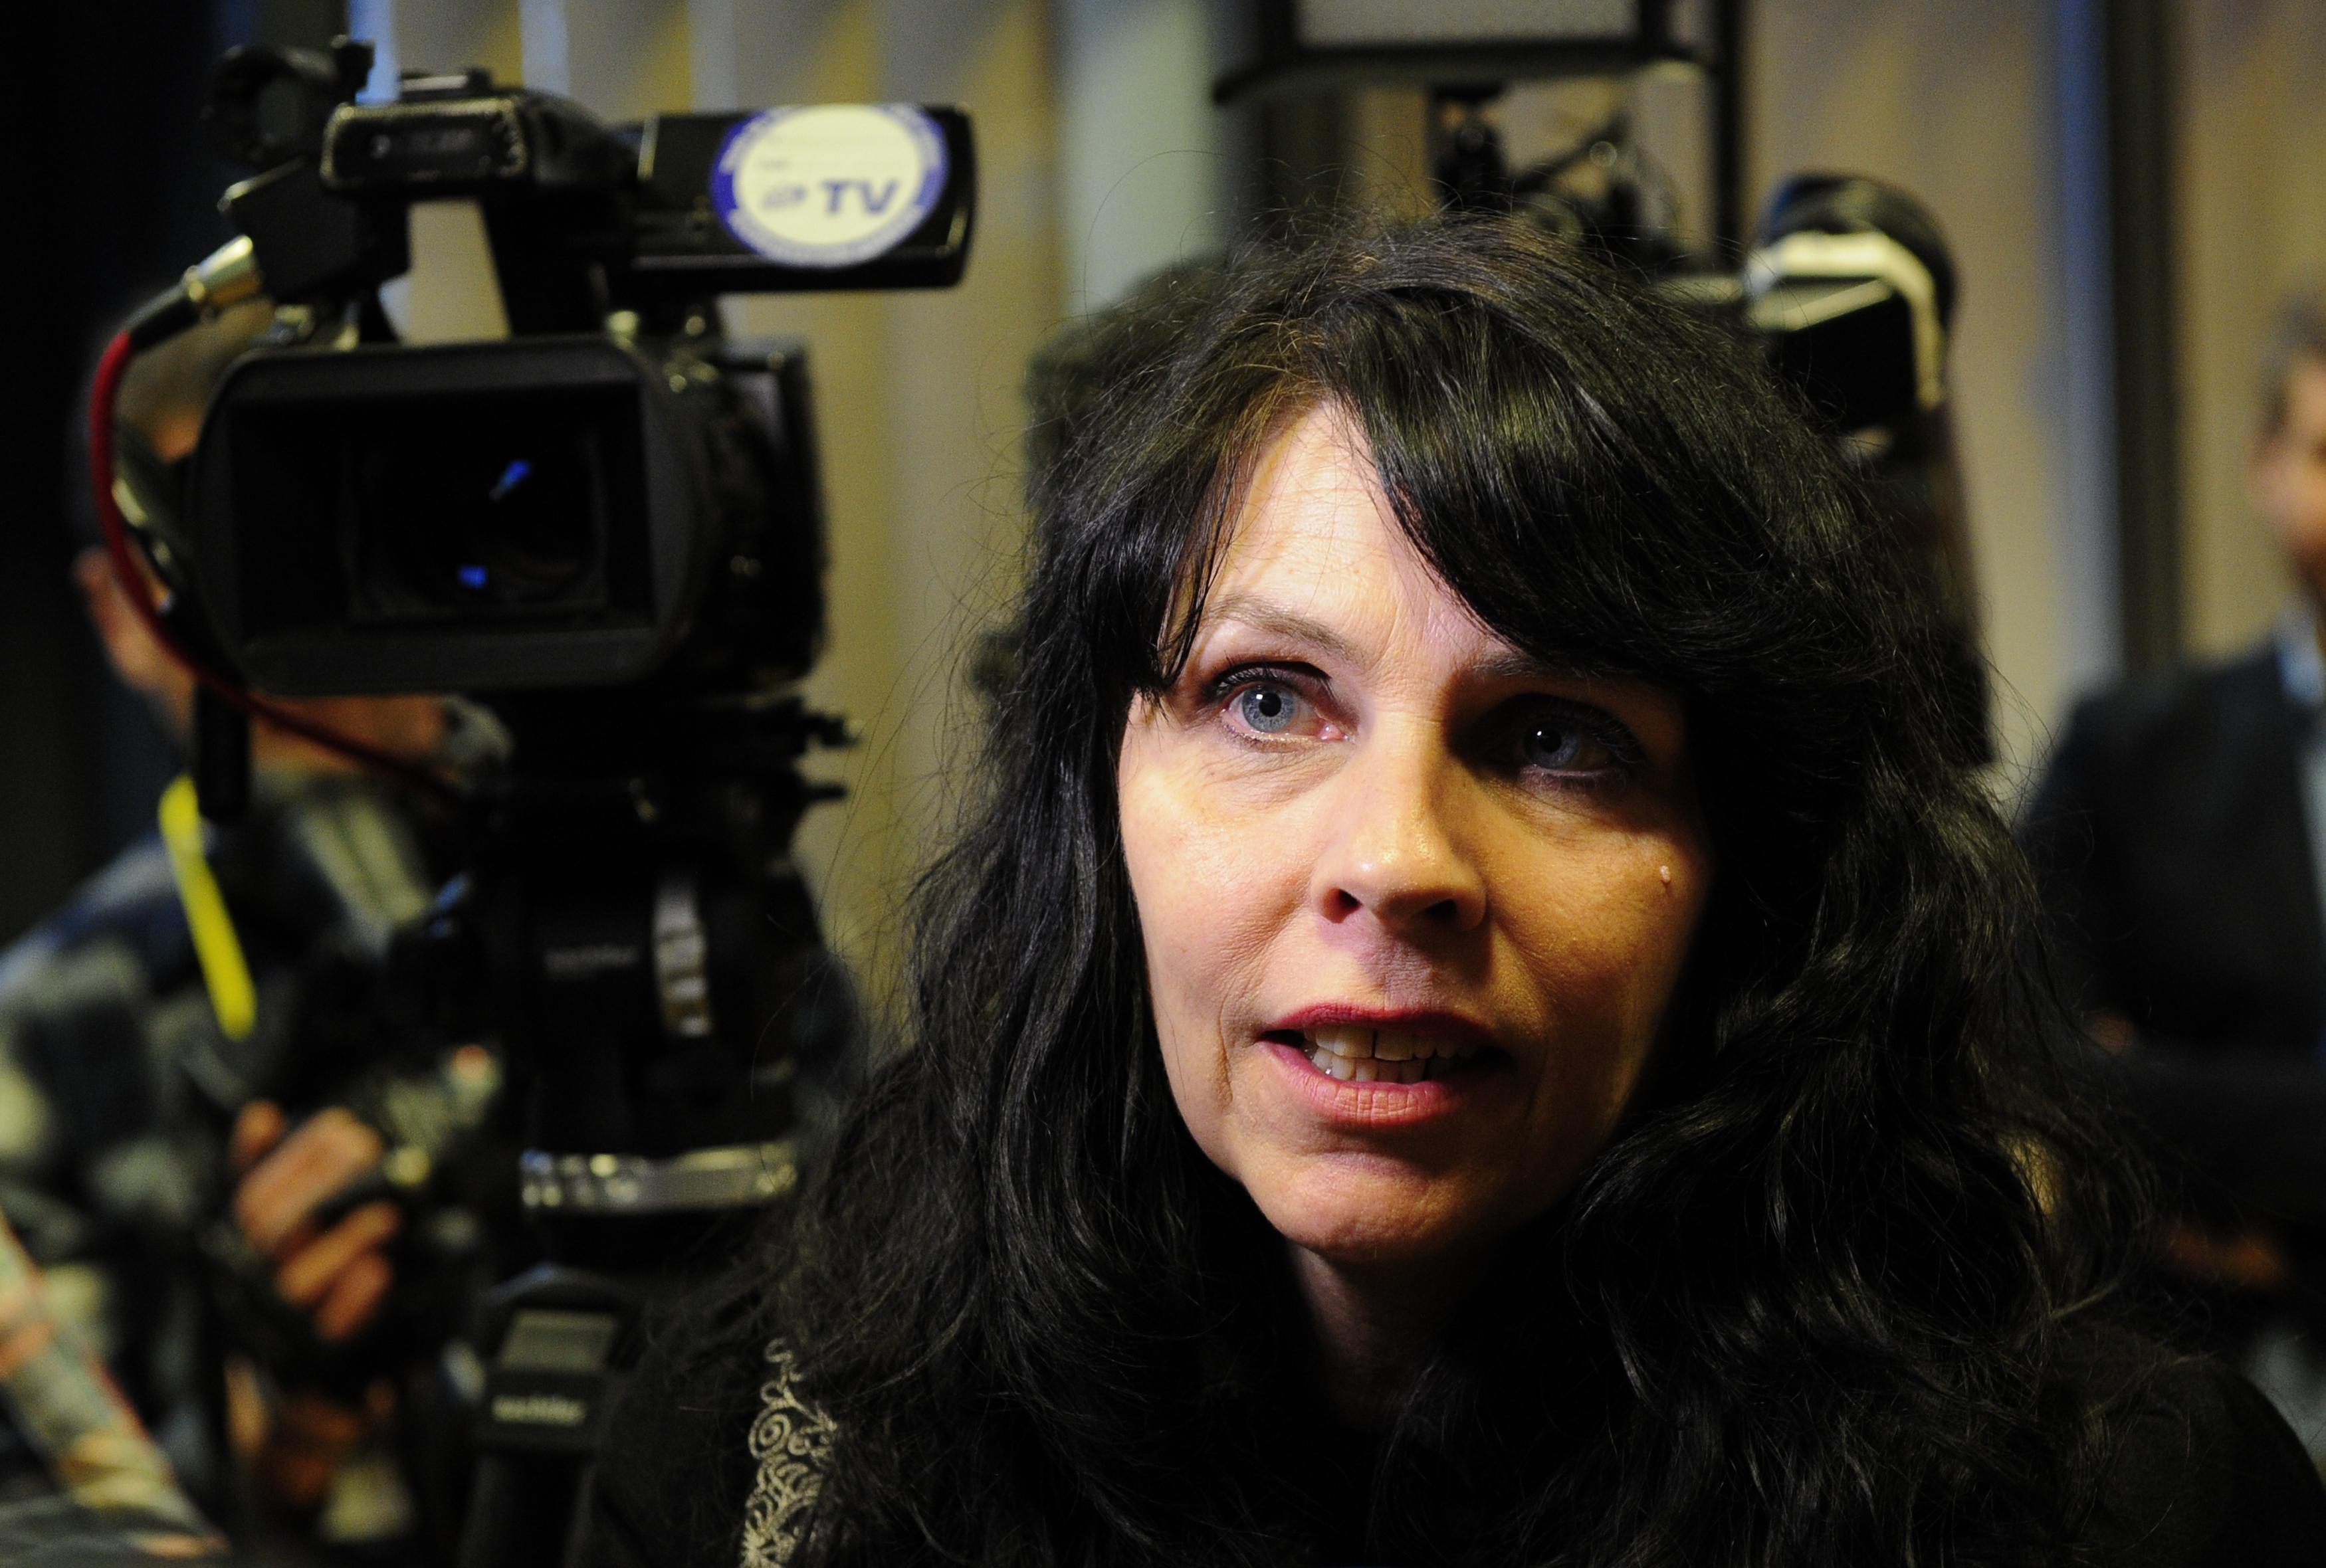 Birgitta Jonsdottir of the Pirate Party speaks in Reykjavik